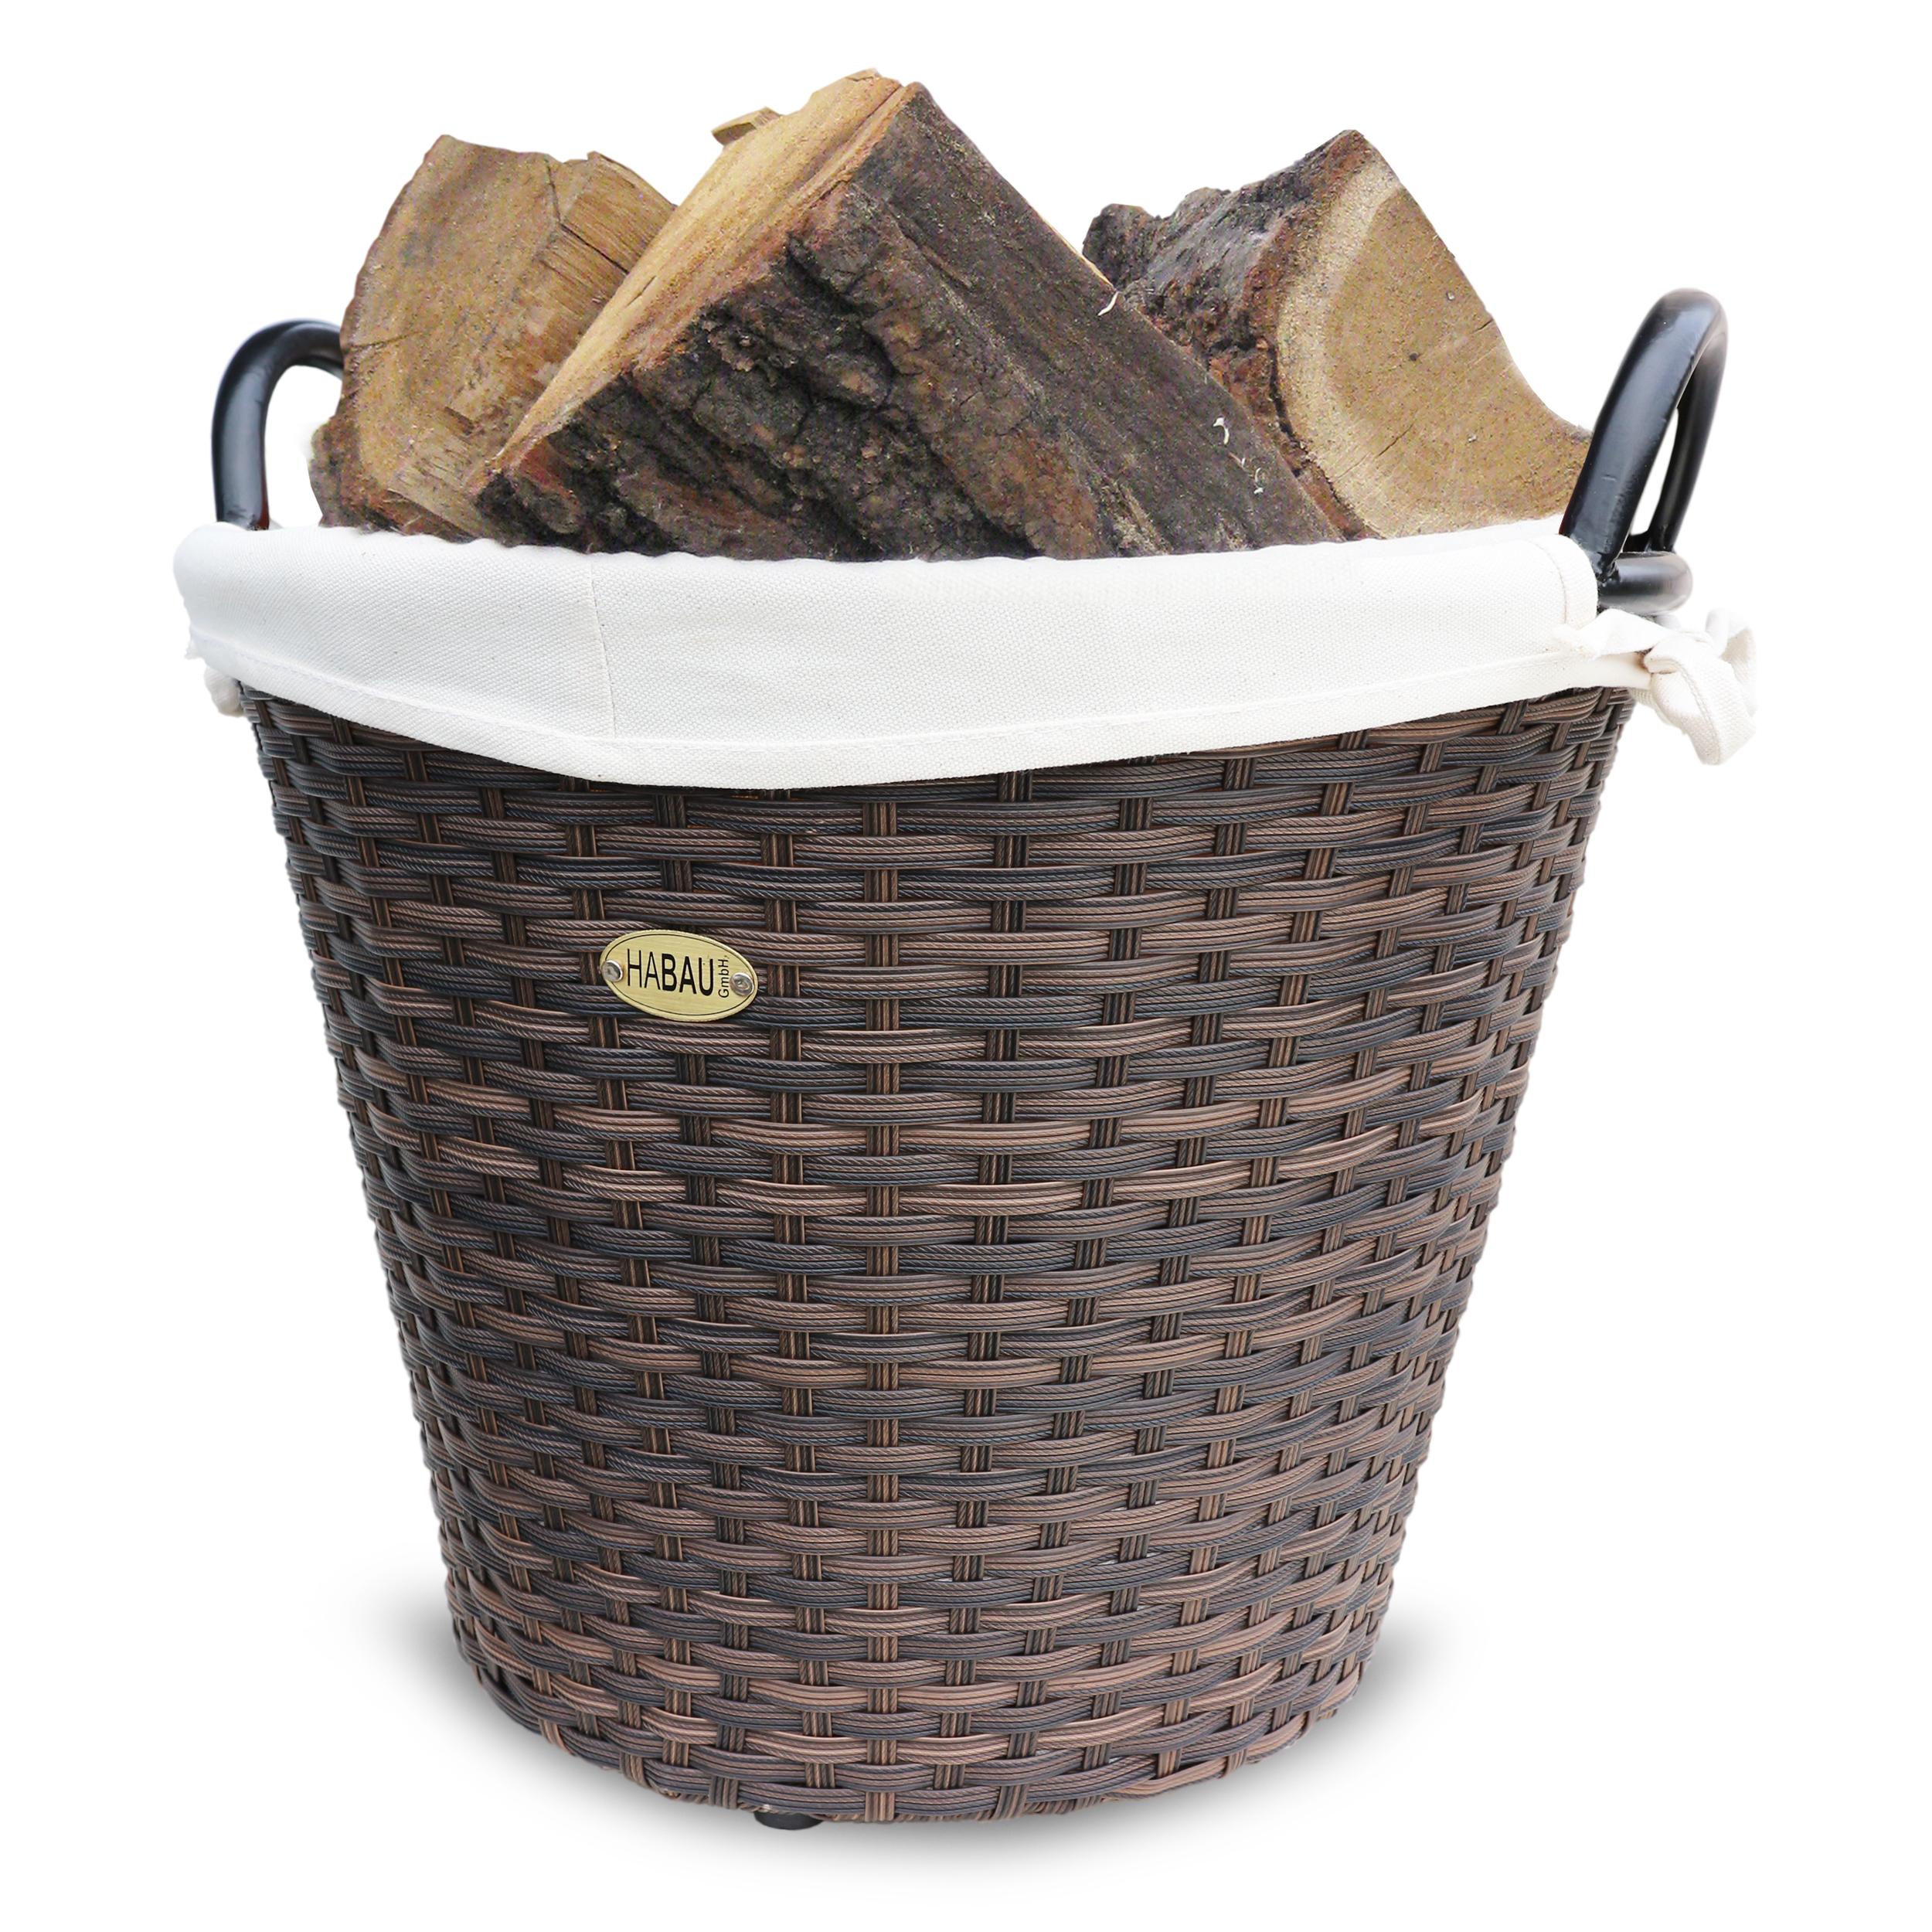 HABAU Feuerholzkorb aus Polyethylen, braun, 48 cm - 2712